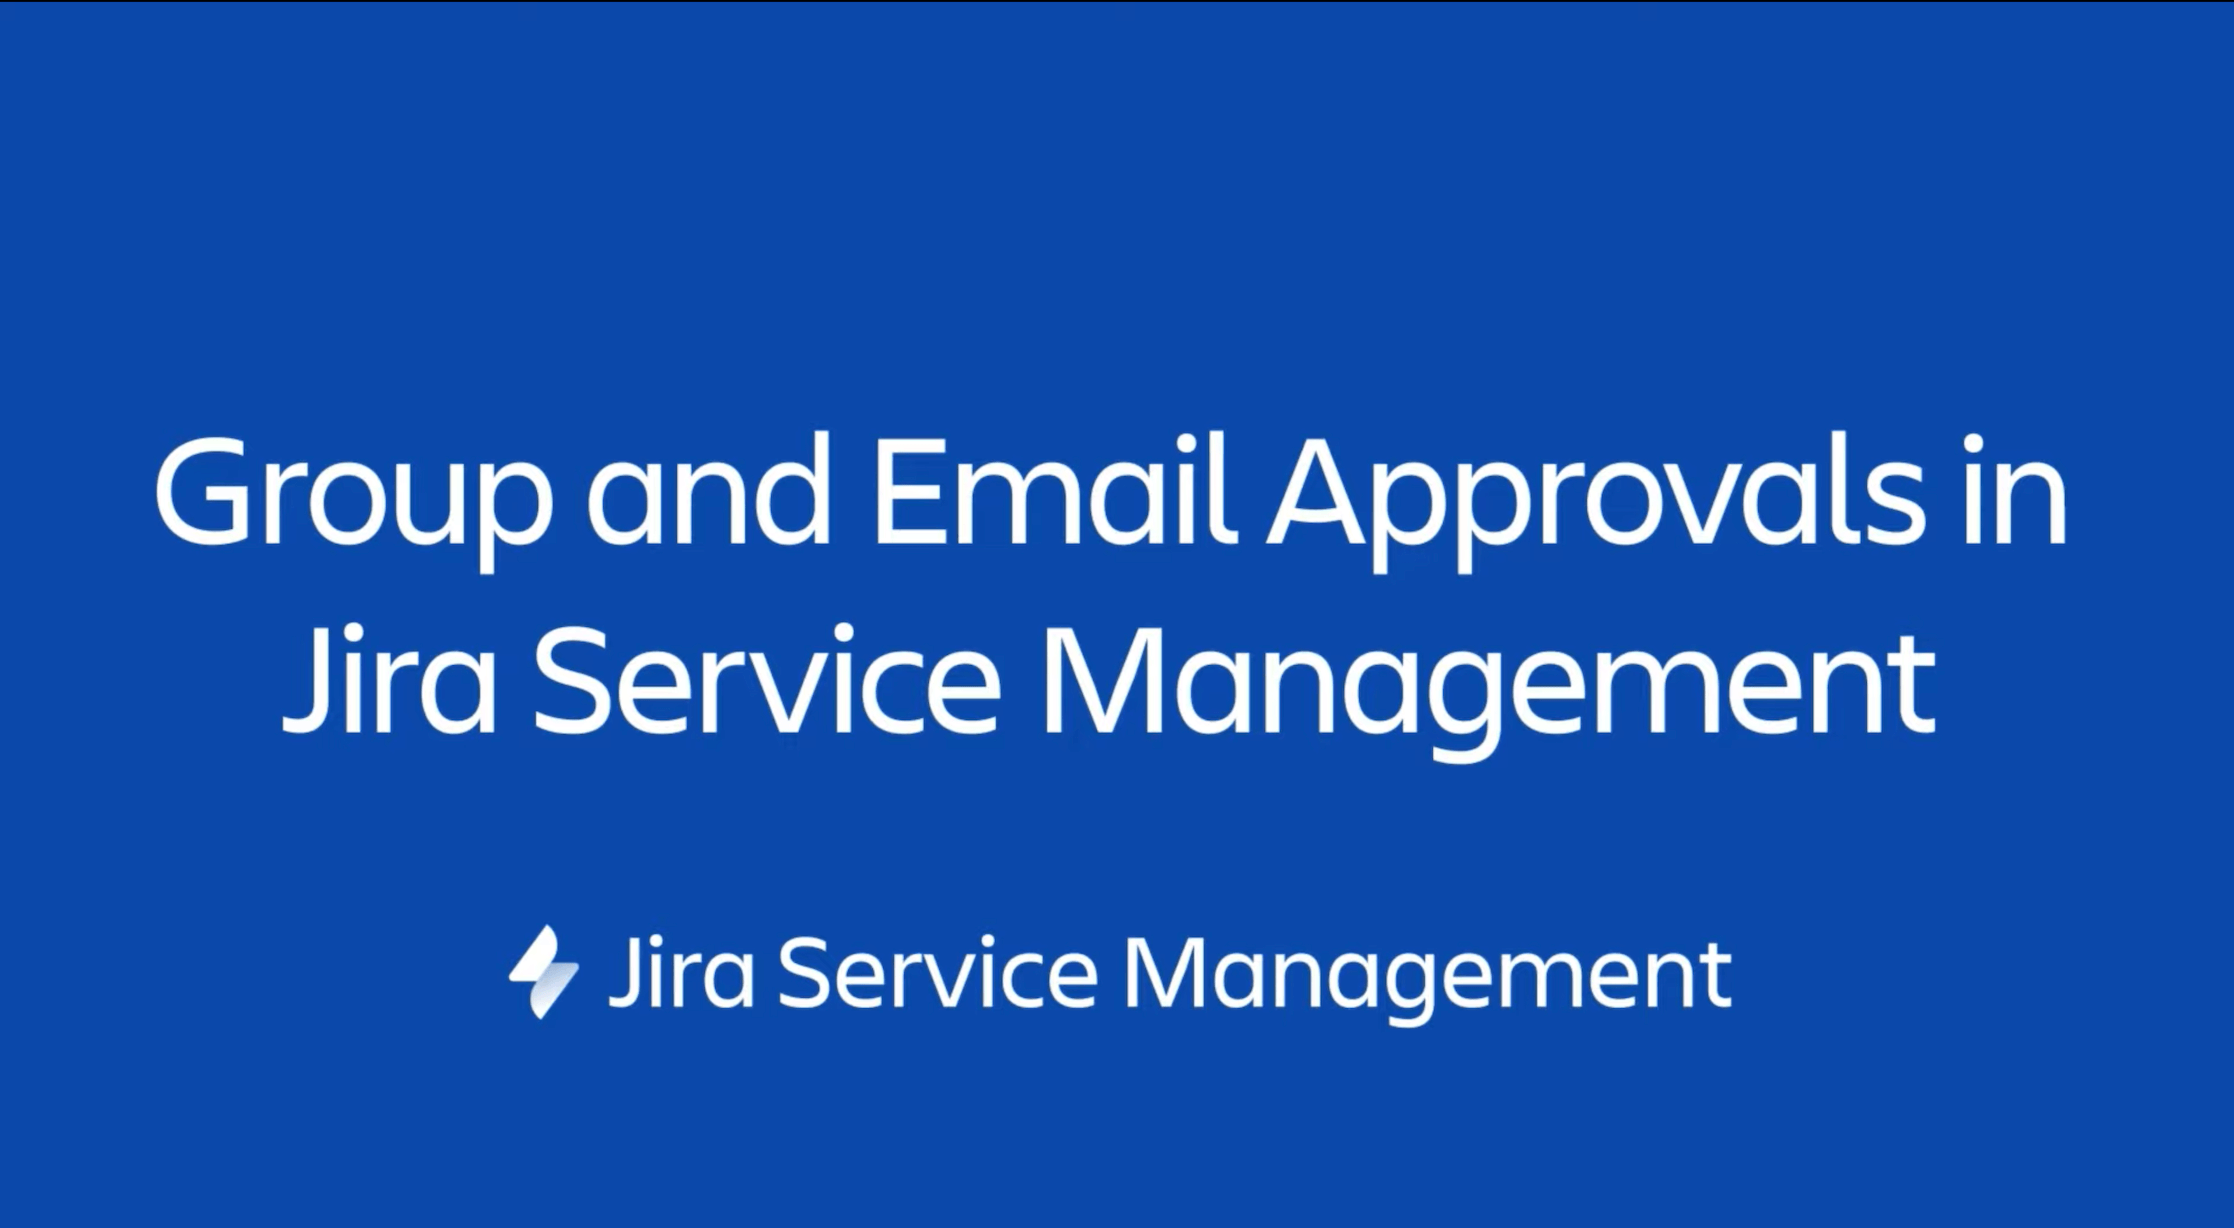 Recopila informes de errores en Jira Service Management